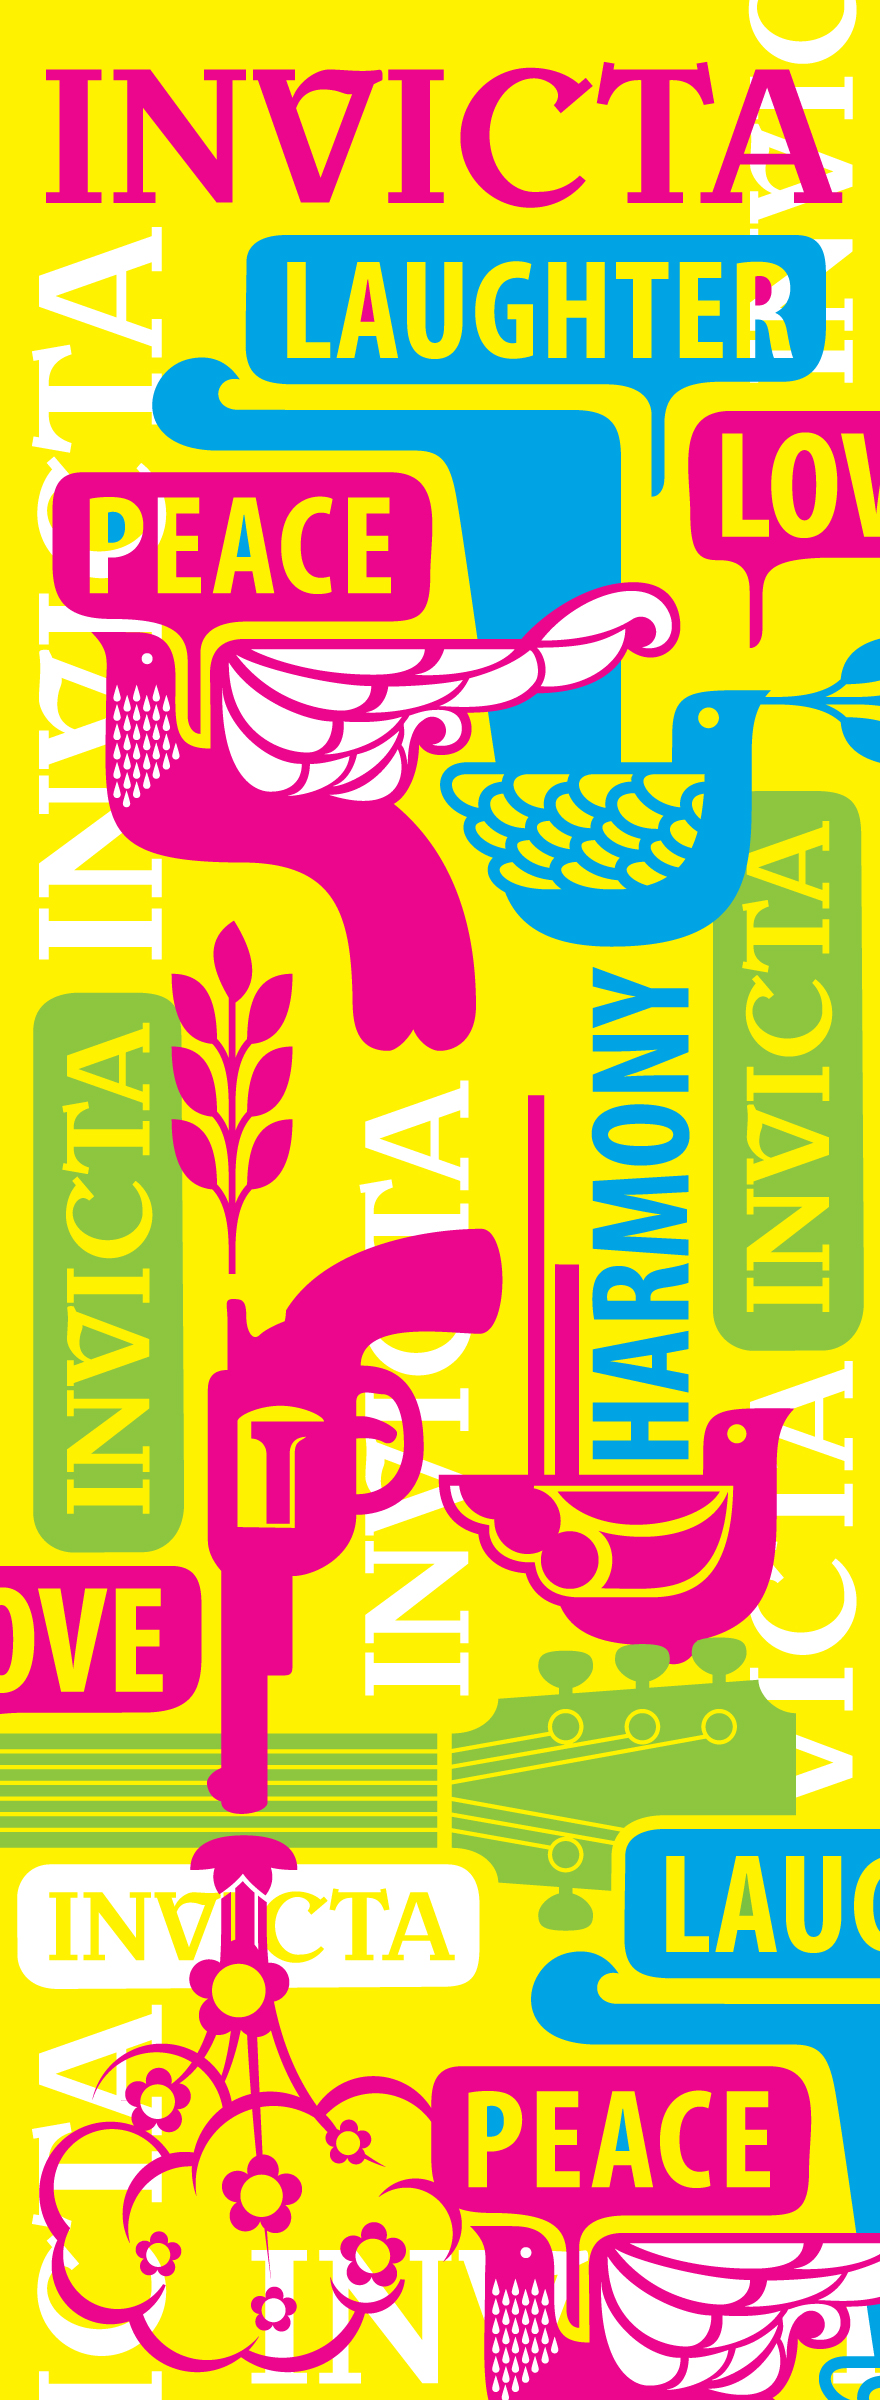 IN_Poster_SNBC_Bohemian_design_B_01.jpg